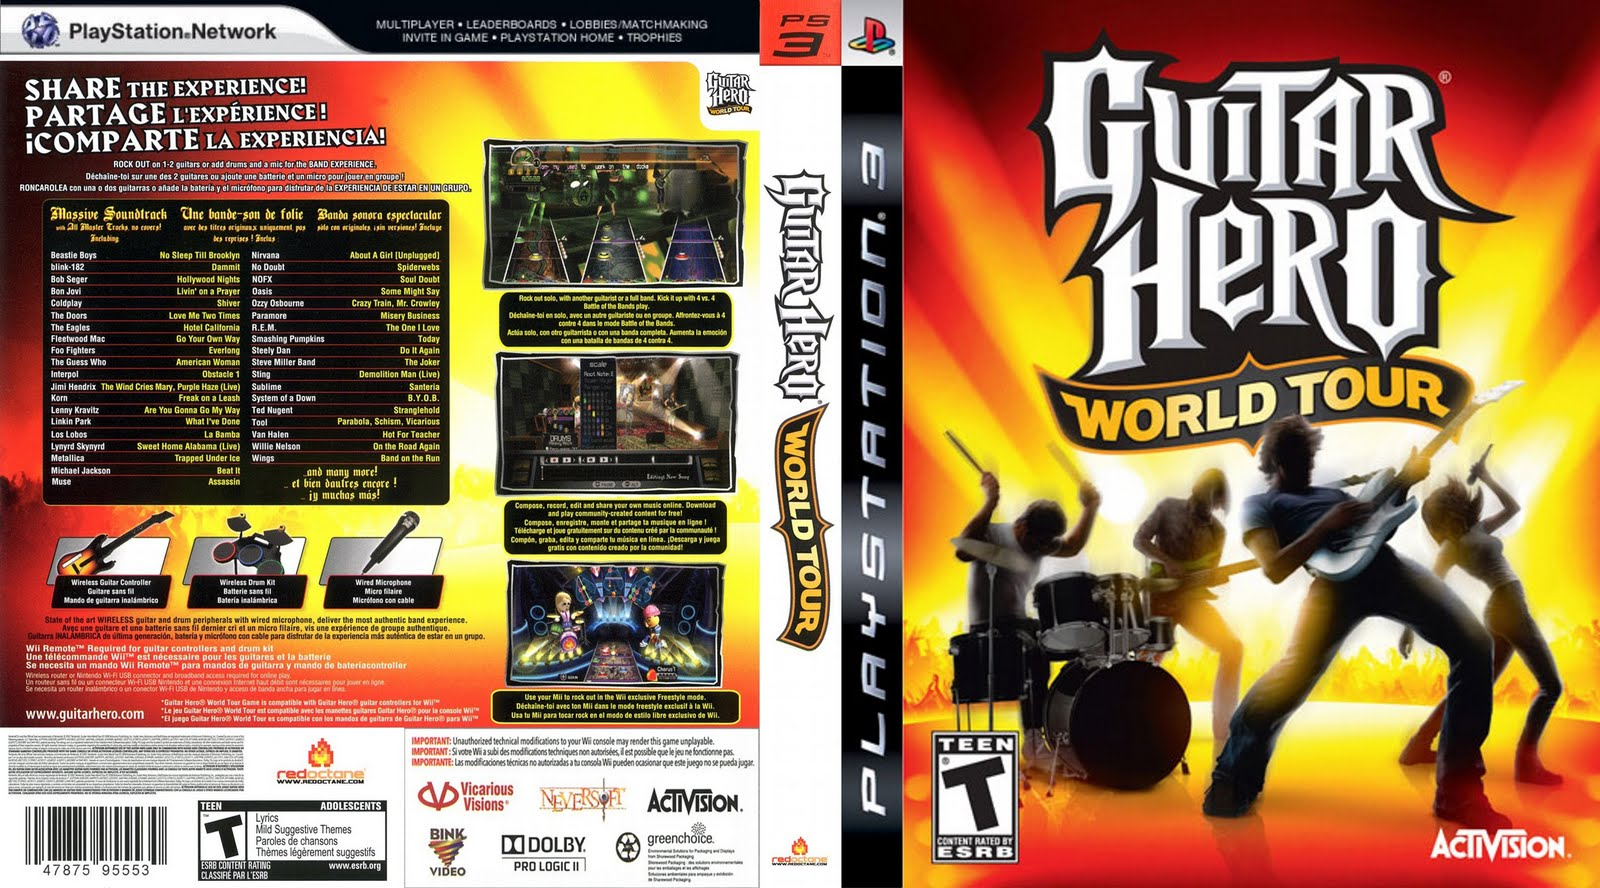 Guitar Hero World Tour Wallpaper